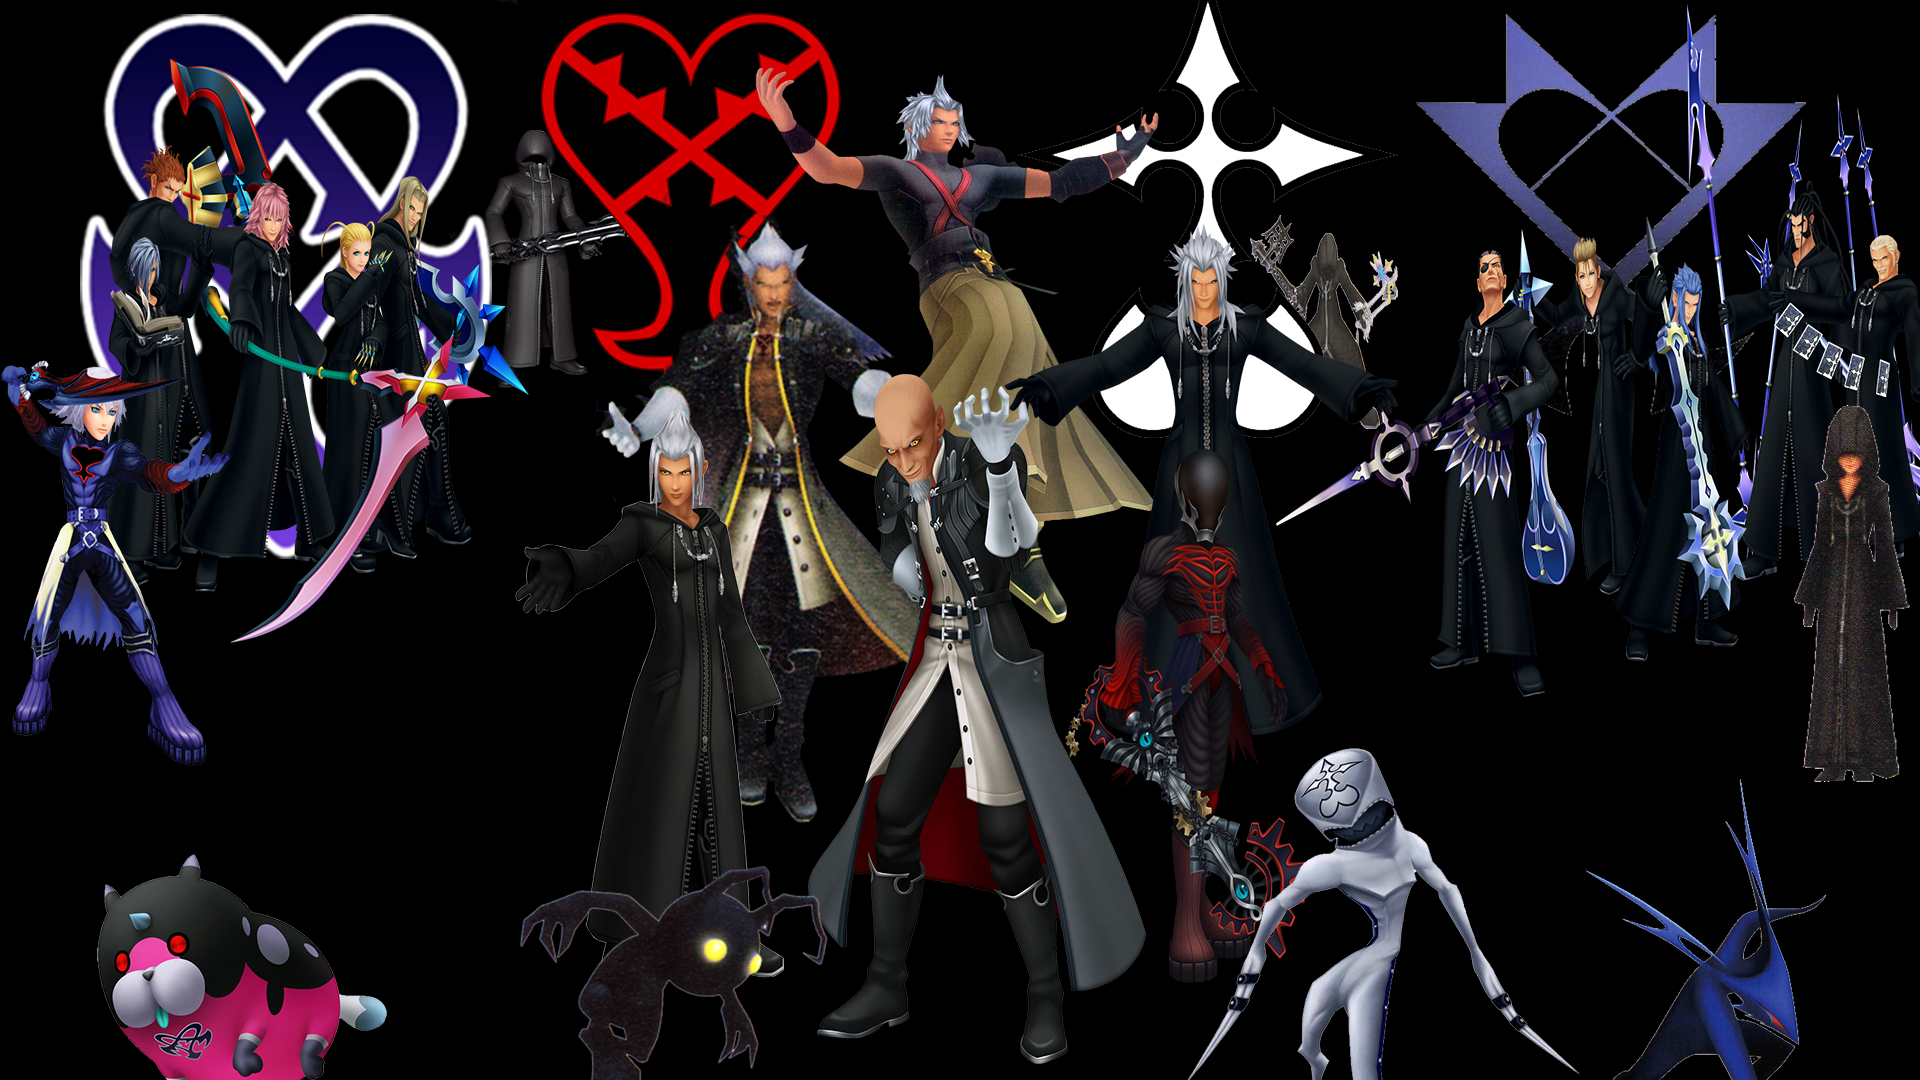 Kingdom Hearts Xehanort Saga Villains by The-Dark-Mamba-995 on DeviantArt